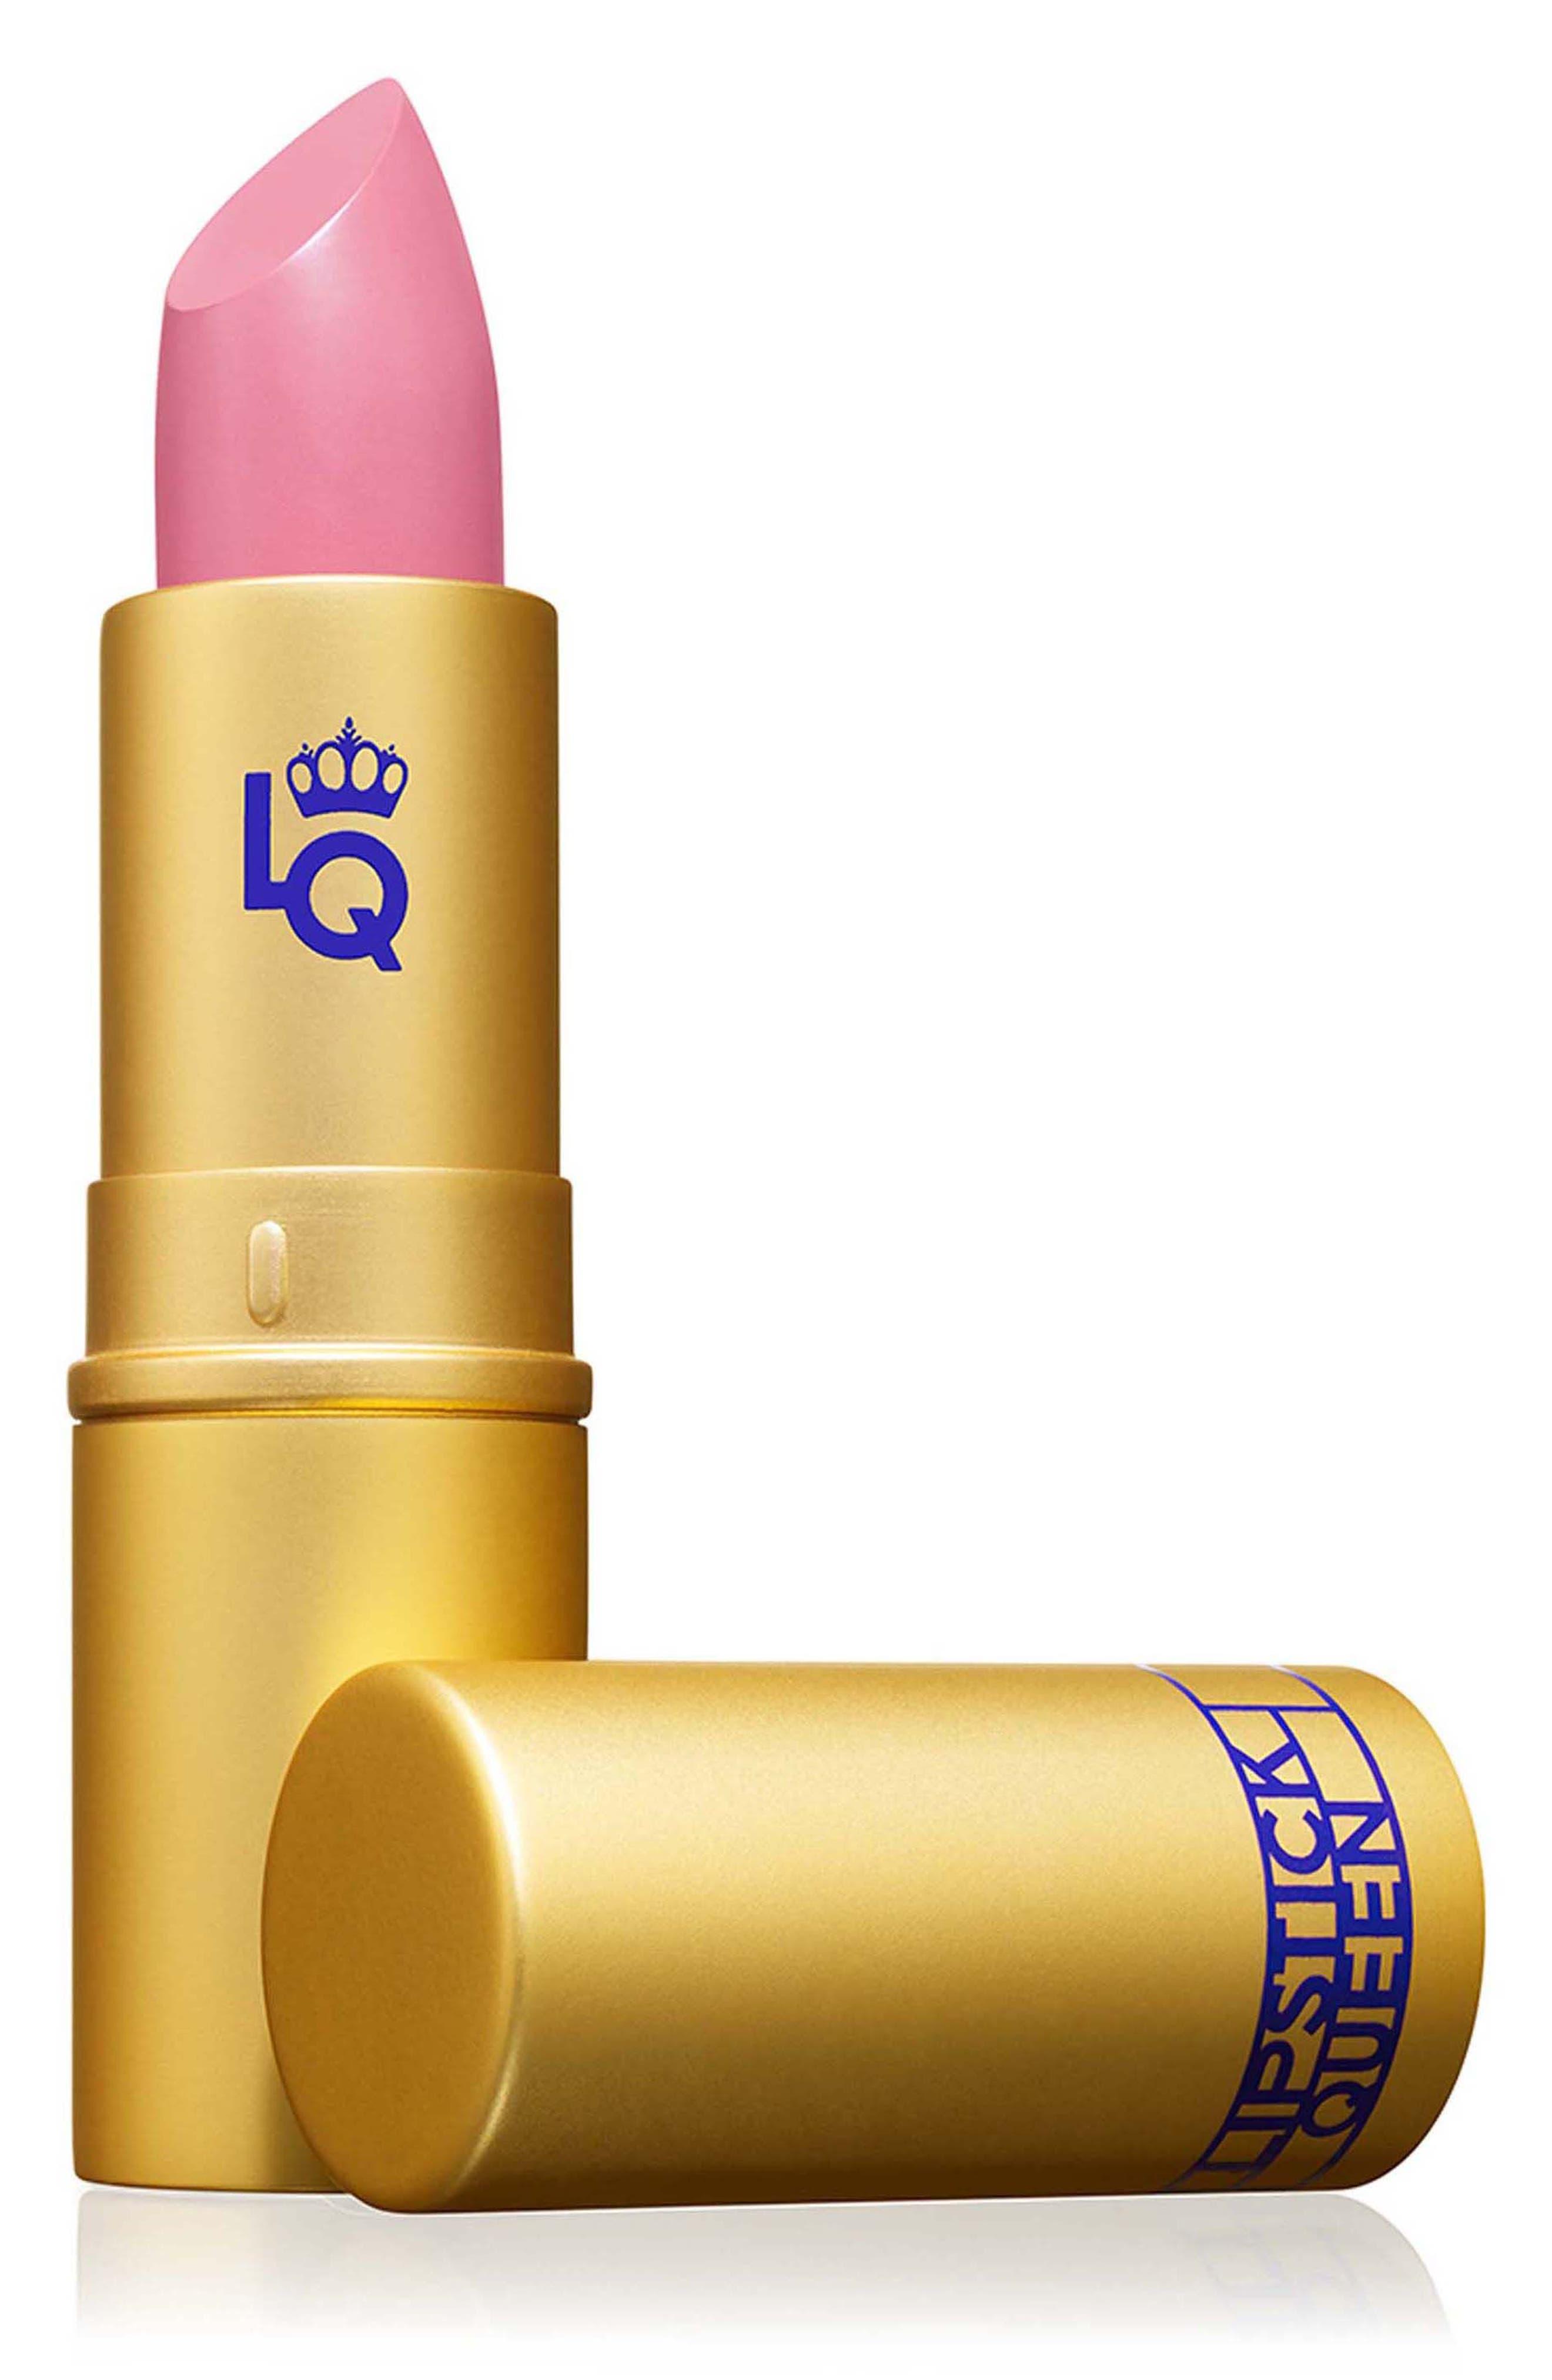 Main Image - SPACE.NK.apothecary Lipstick Queen Saint Sheer Lipstick